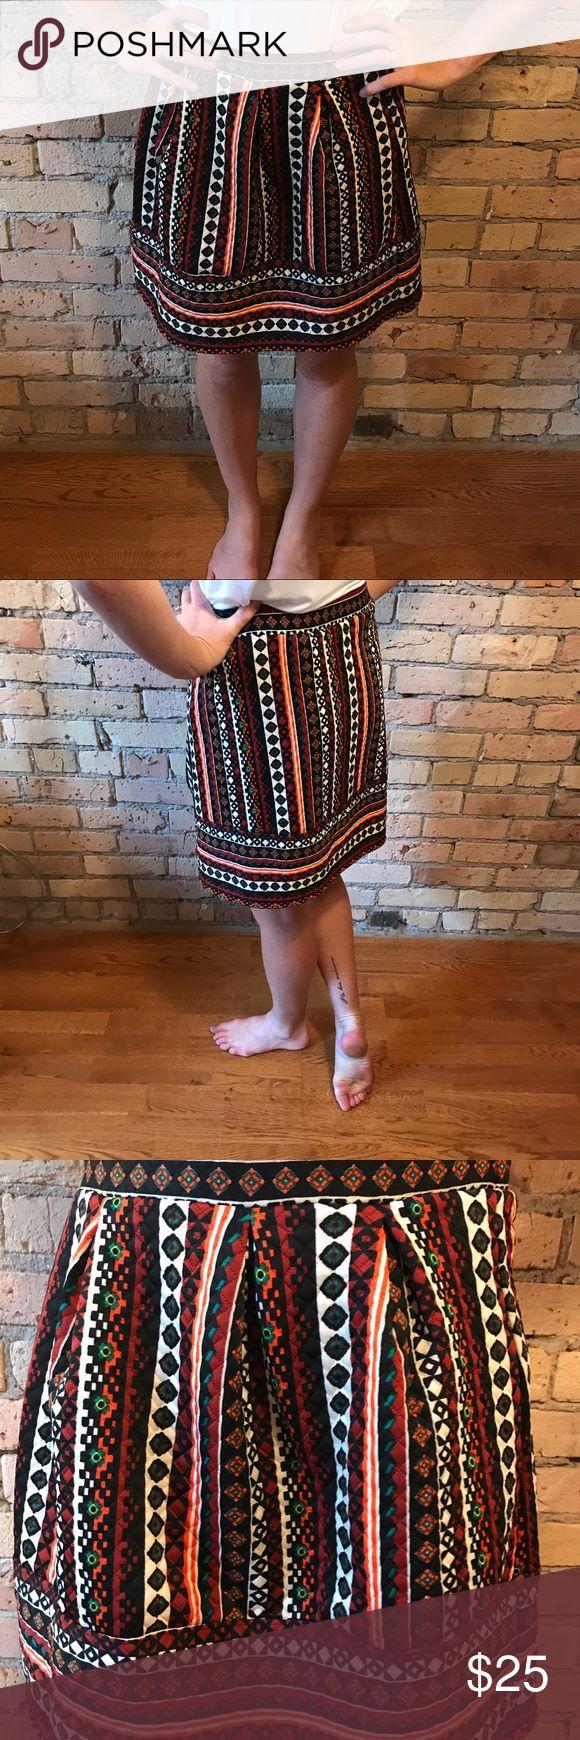 Size medium new without tags tribal skirt Size medium new without tags tribal skirt, stretchy material. Xhilaration Skirts Midi